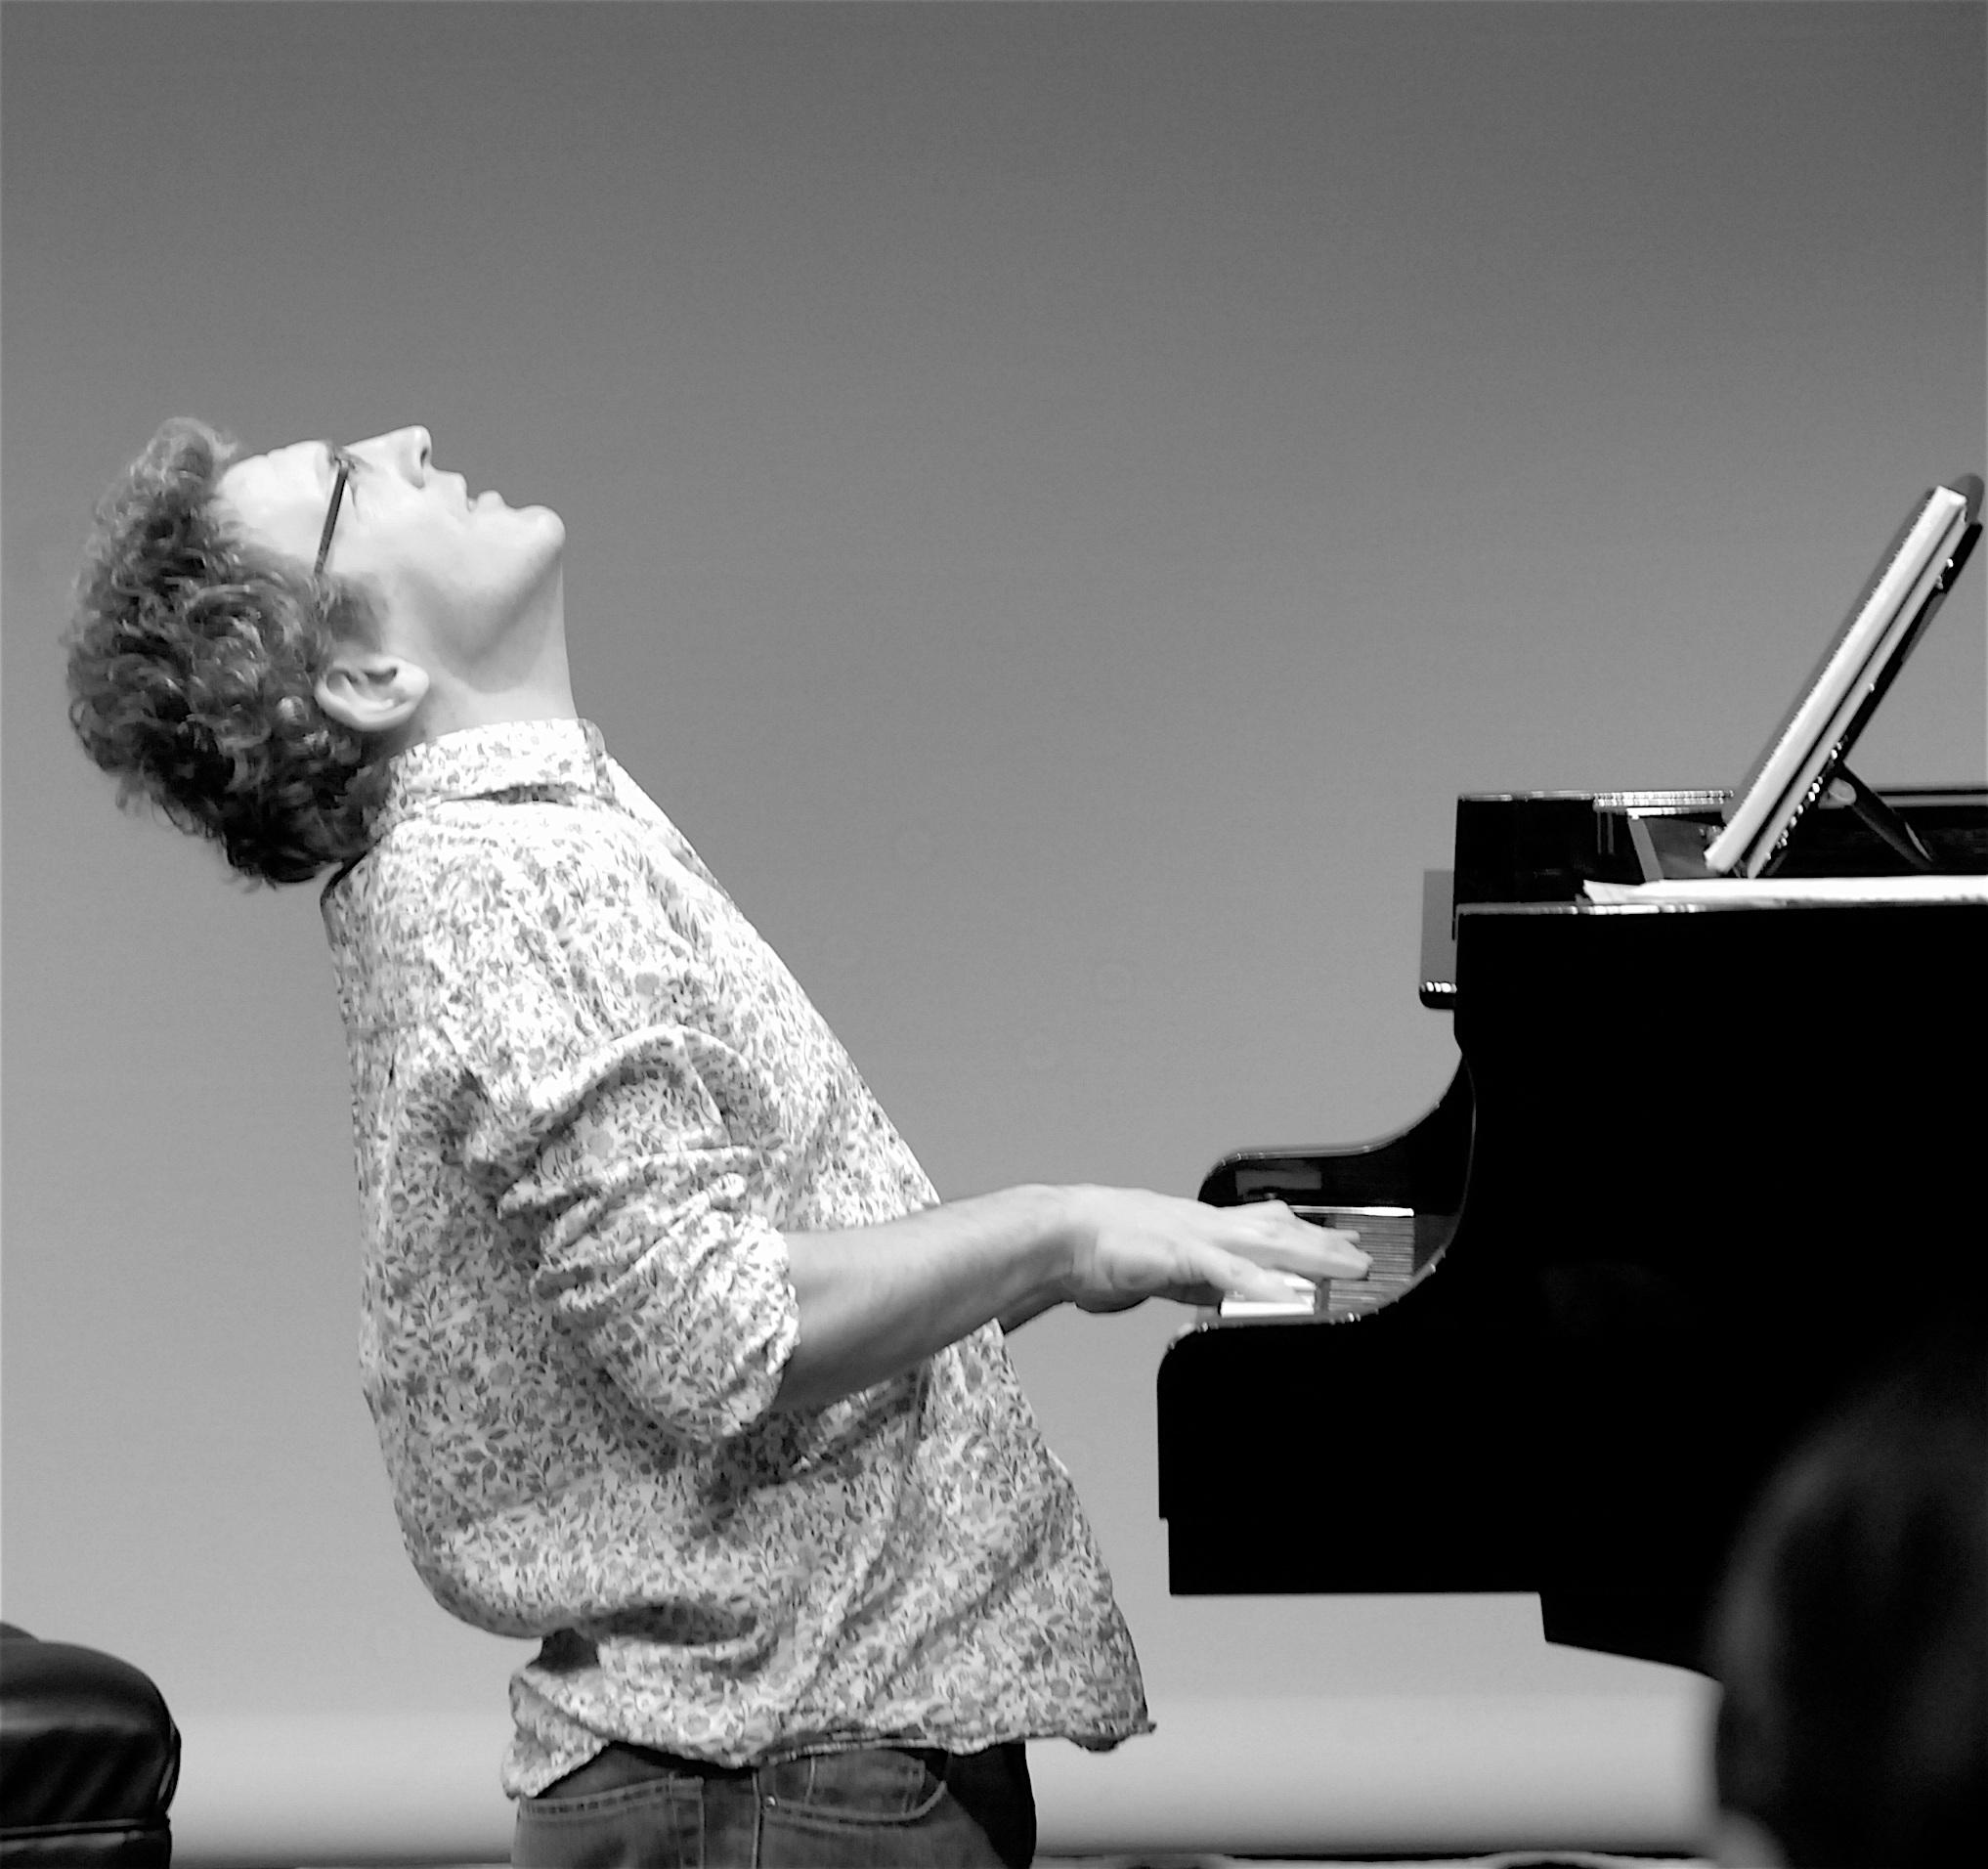 Hugh+piano+stretch.jpg